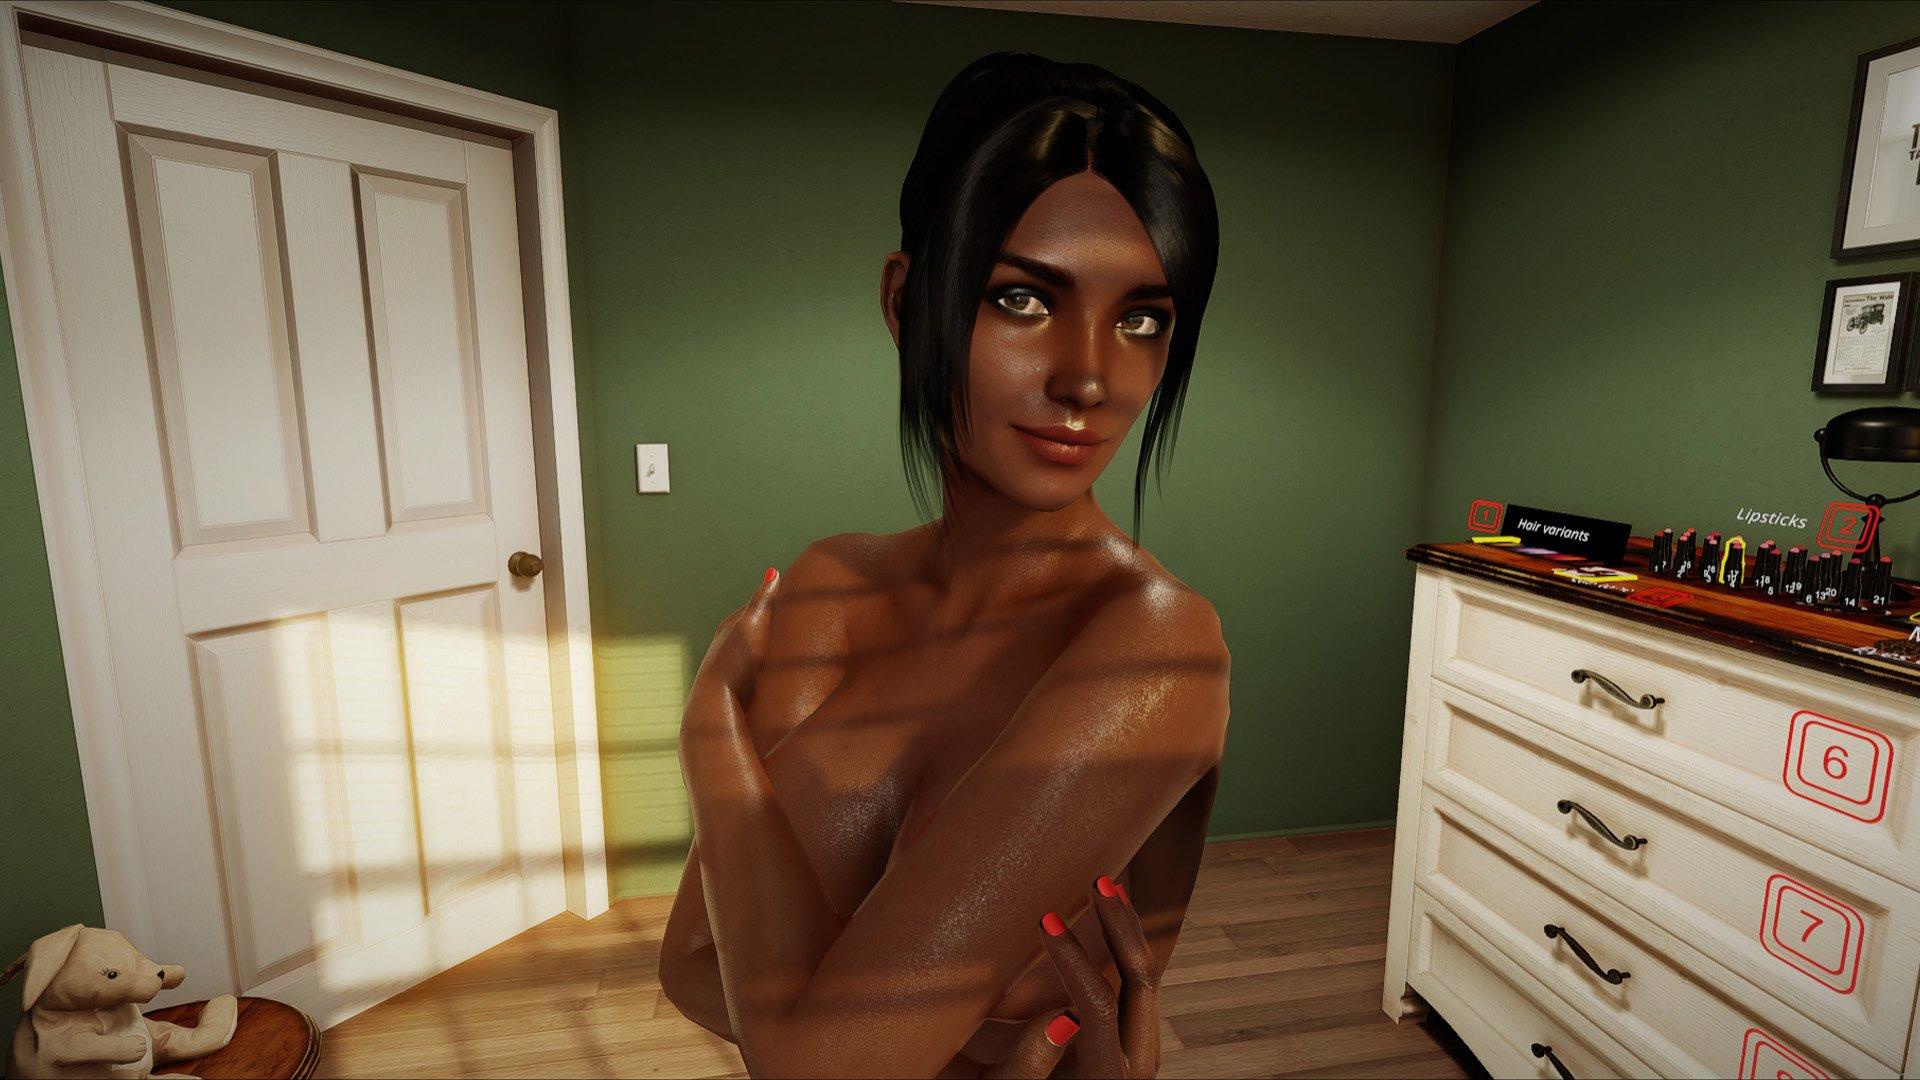 simulation Game - Love Vibe: Aria VR